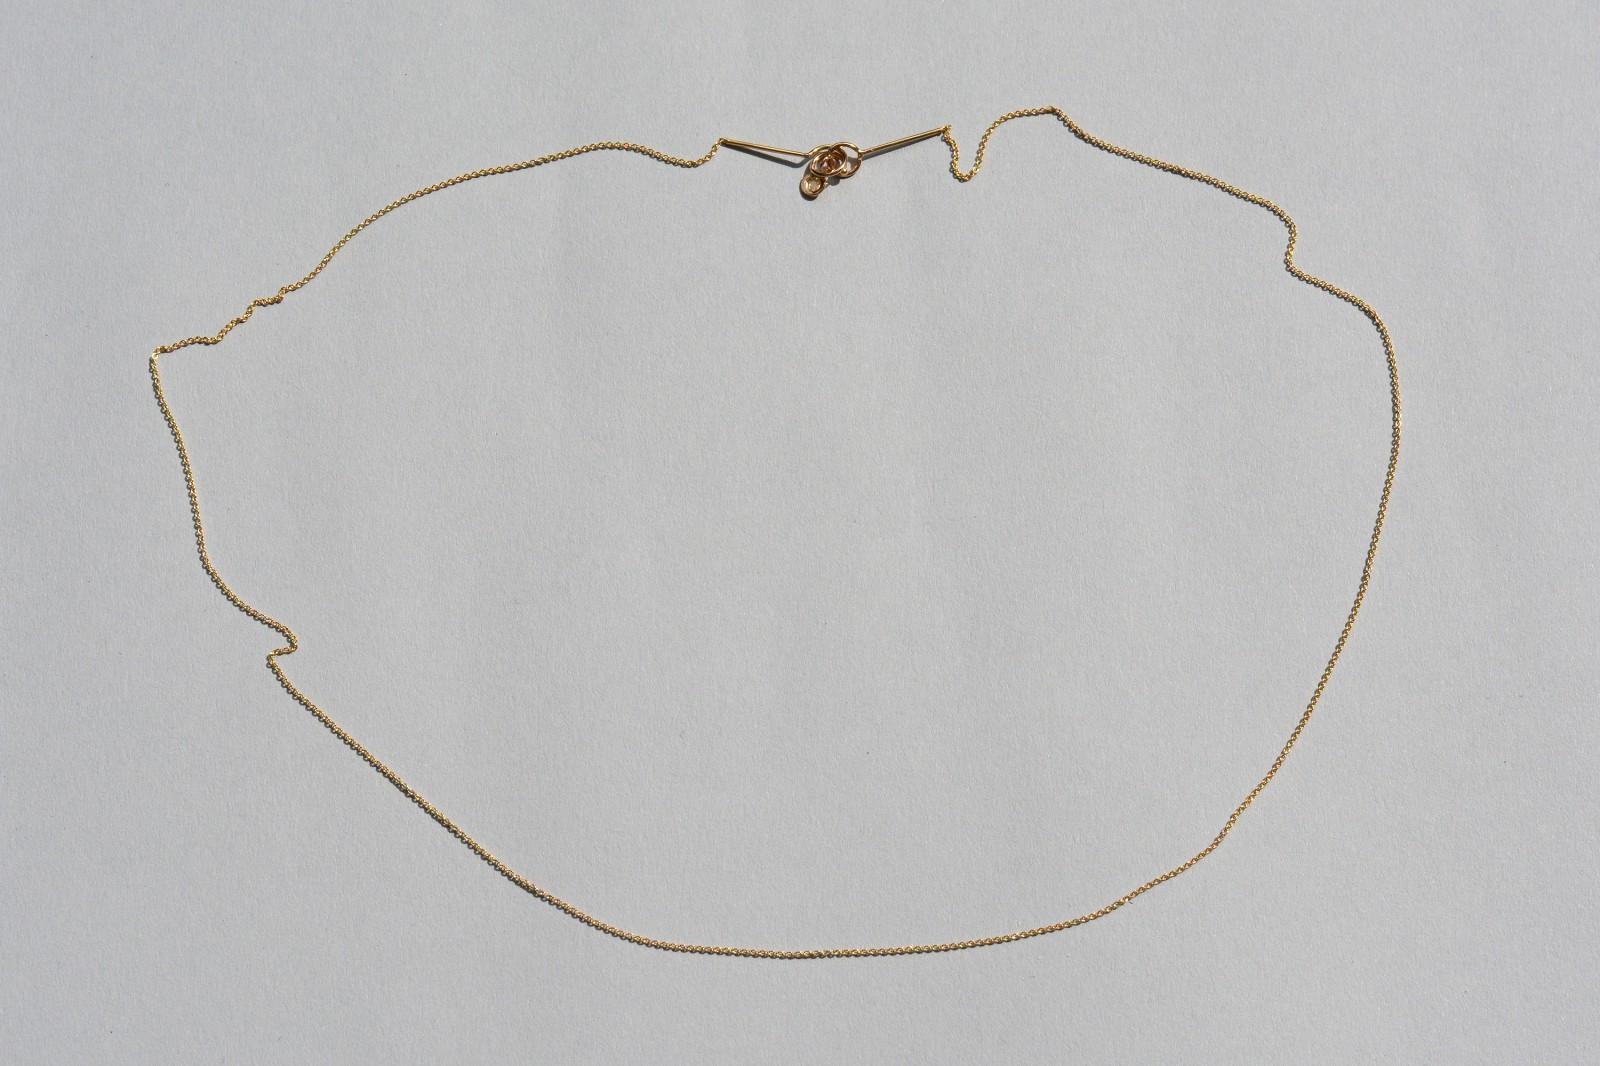 Ultrafine necklace · Saskia Diez